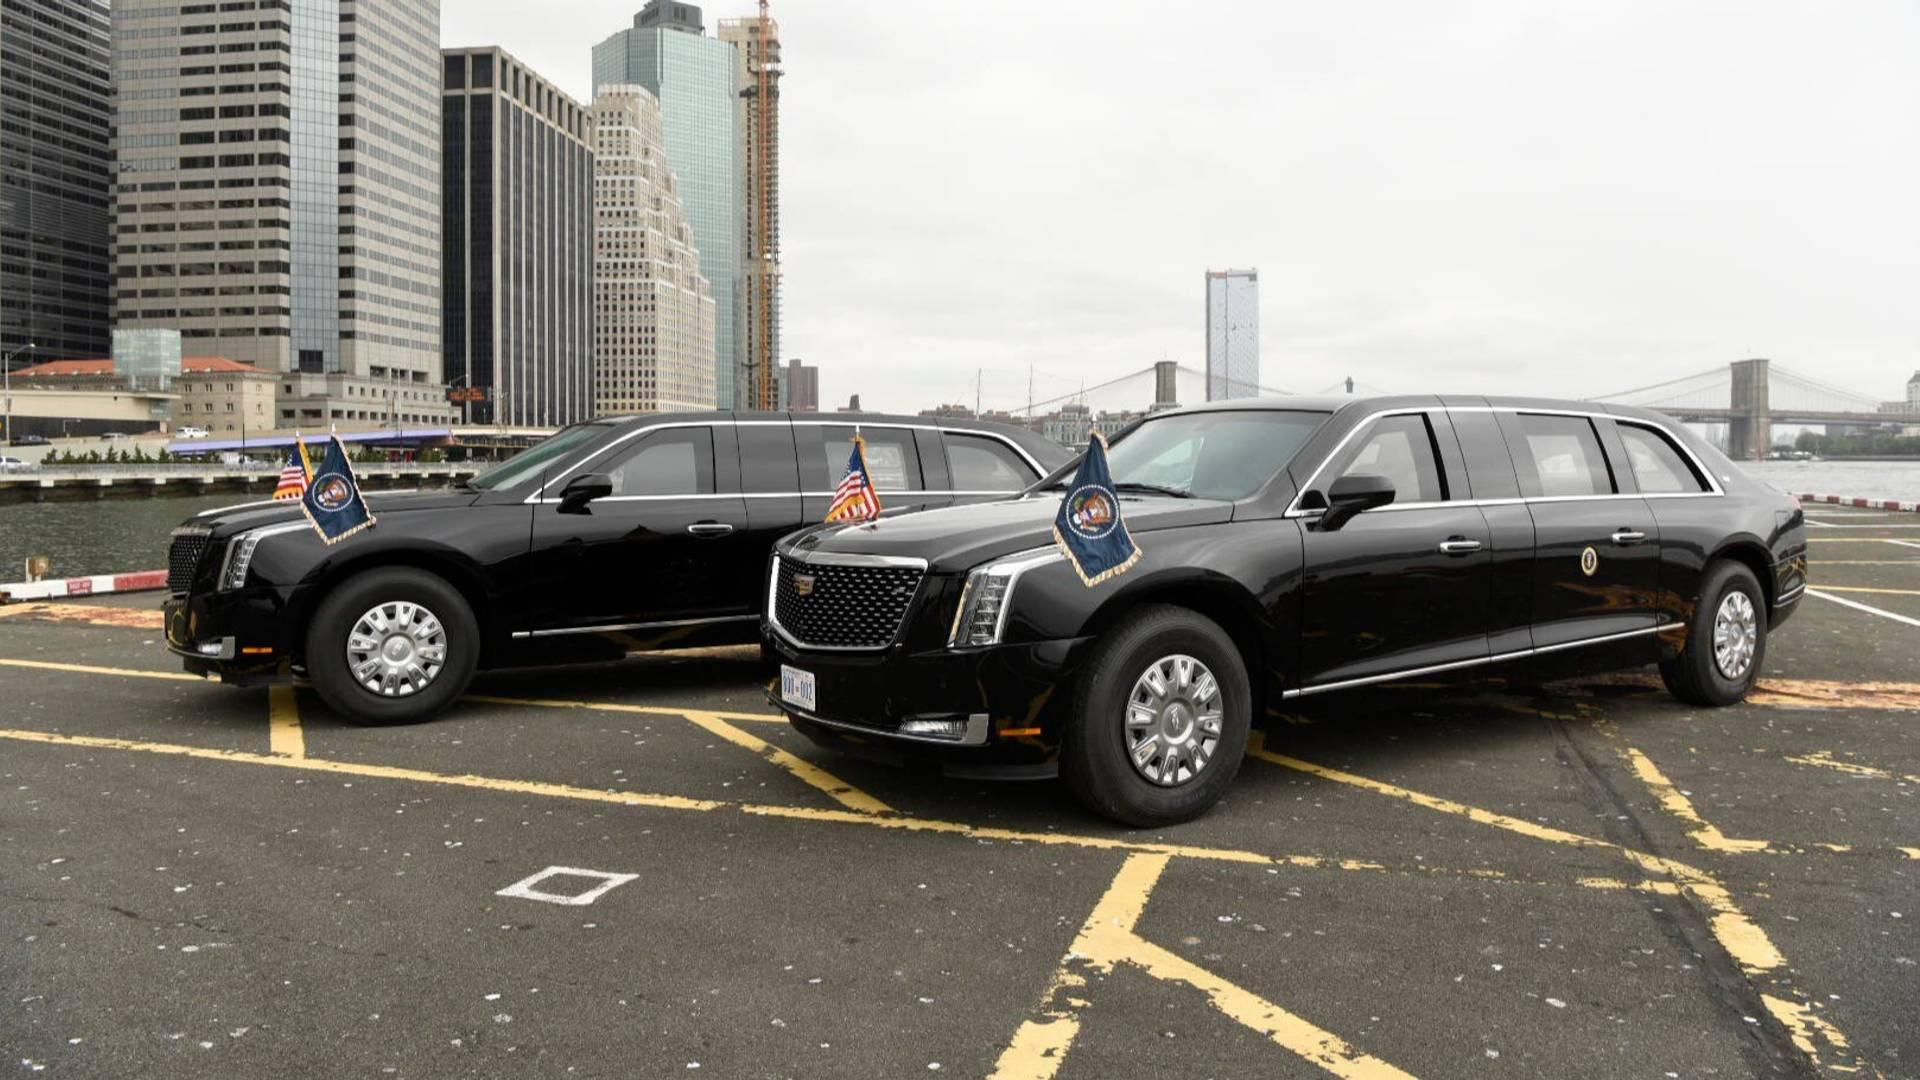 لیموزین جدید ترامپ در نیویورک